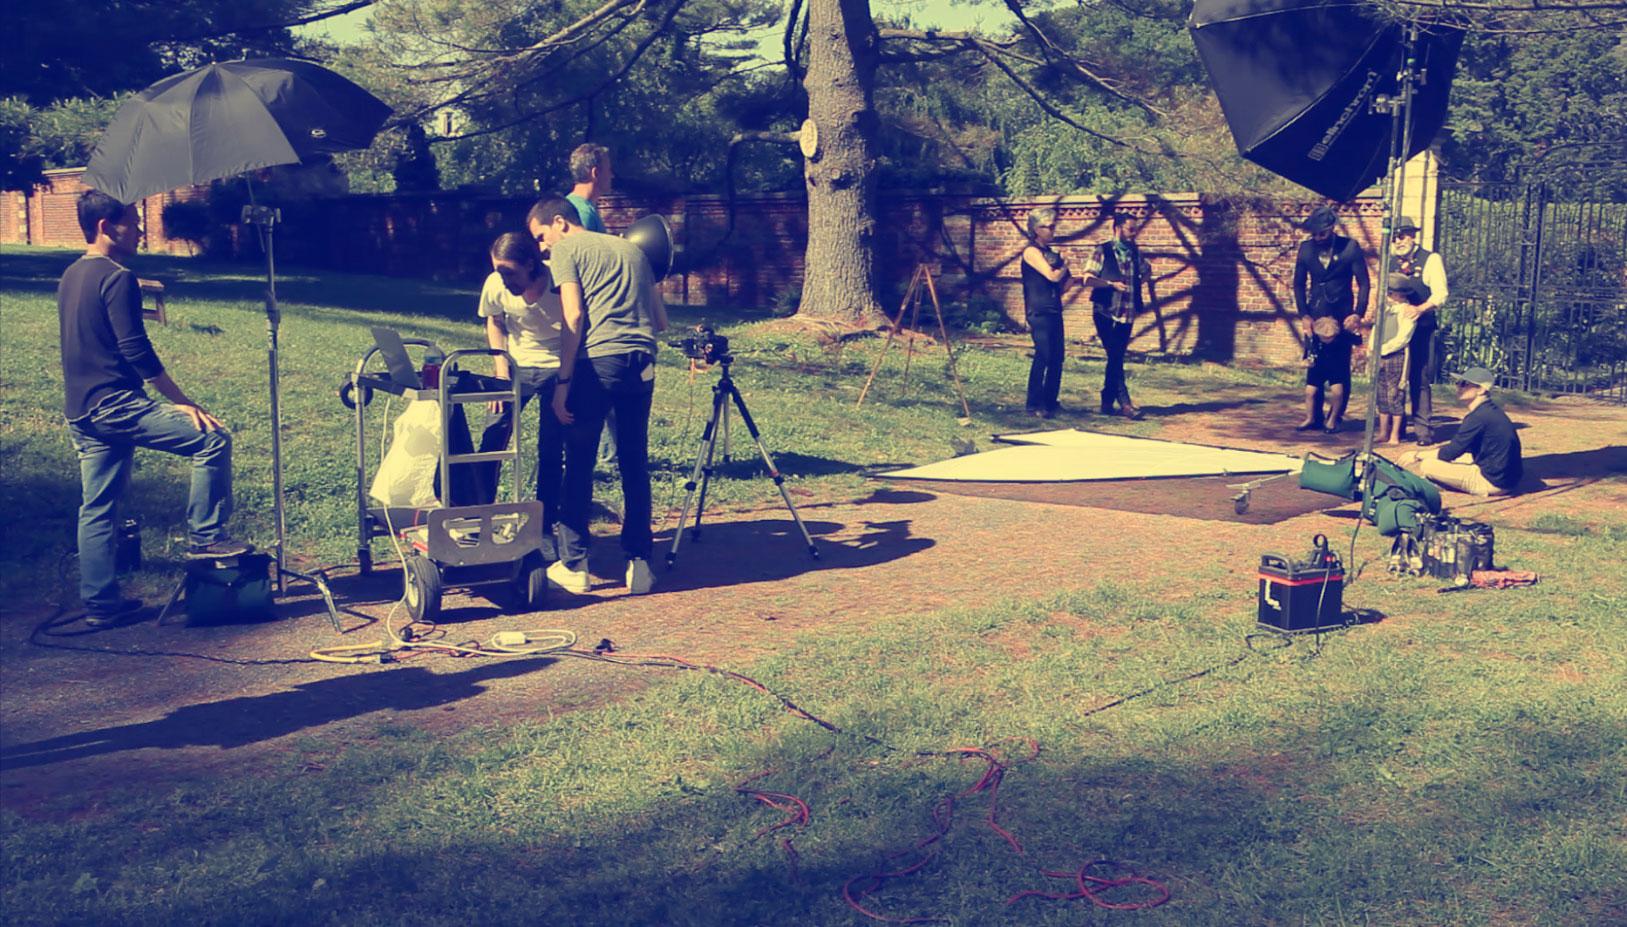 behind the scenes / Royal Misfits / Oxana, Sasha, Gianluca, Michael Novick, Susannah Bianchi, Land Grant, Grey Bazzani Grant by Daniel Castro